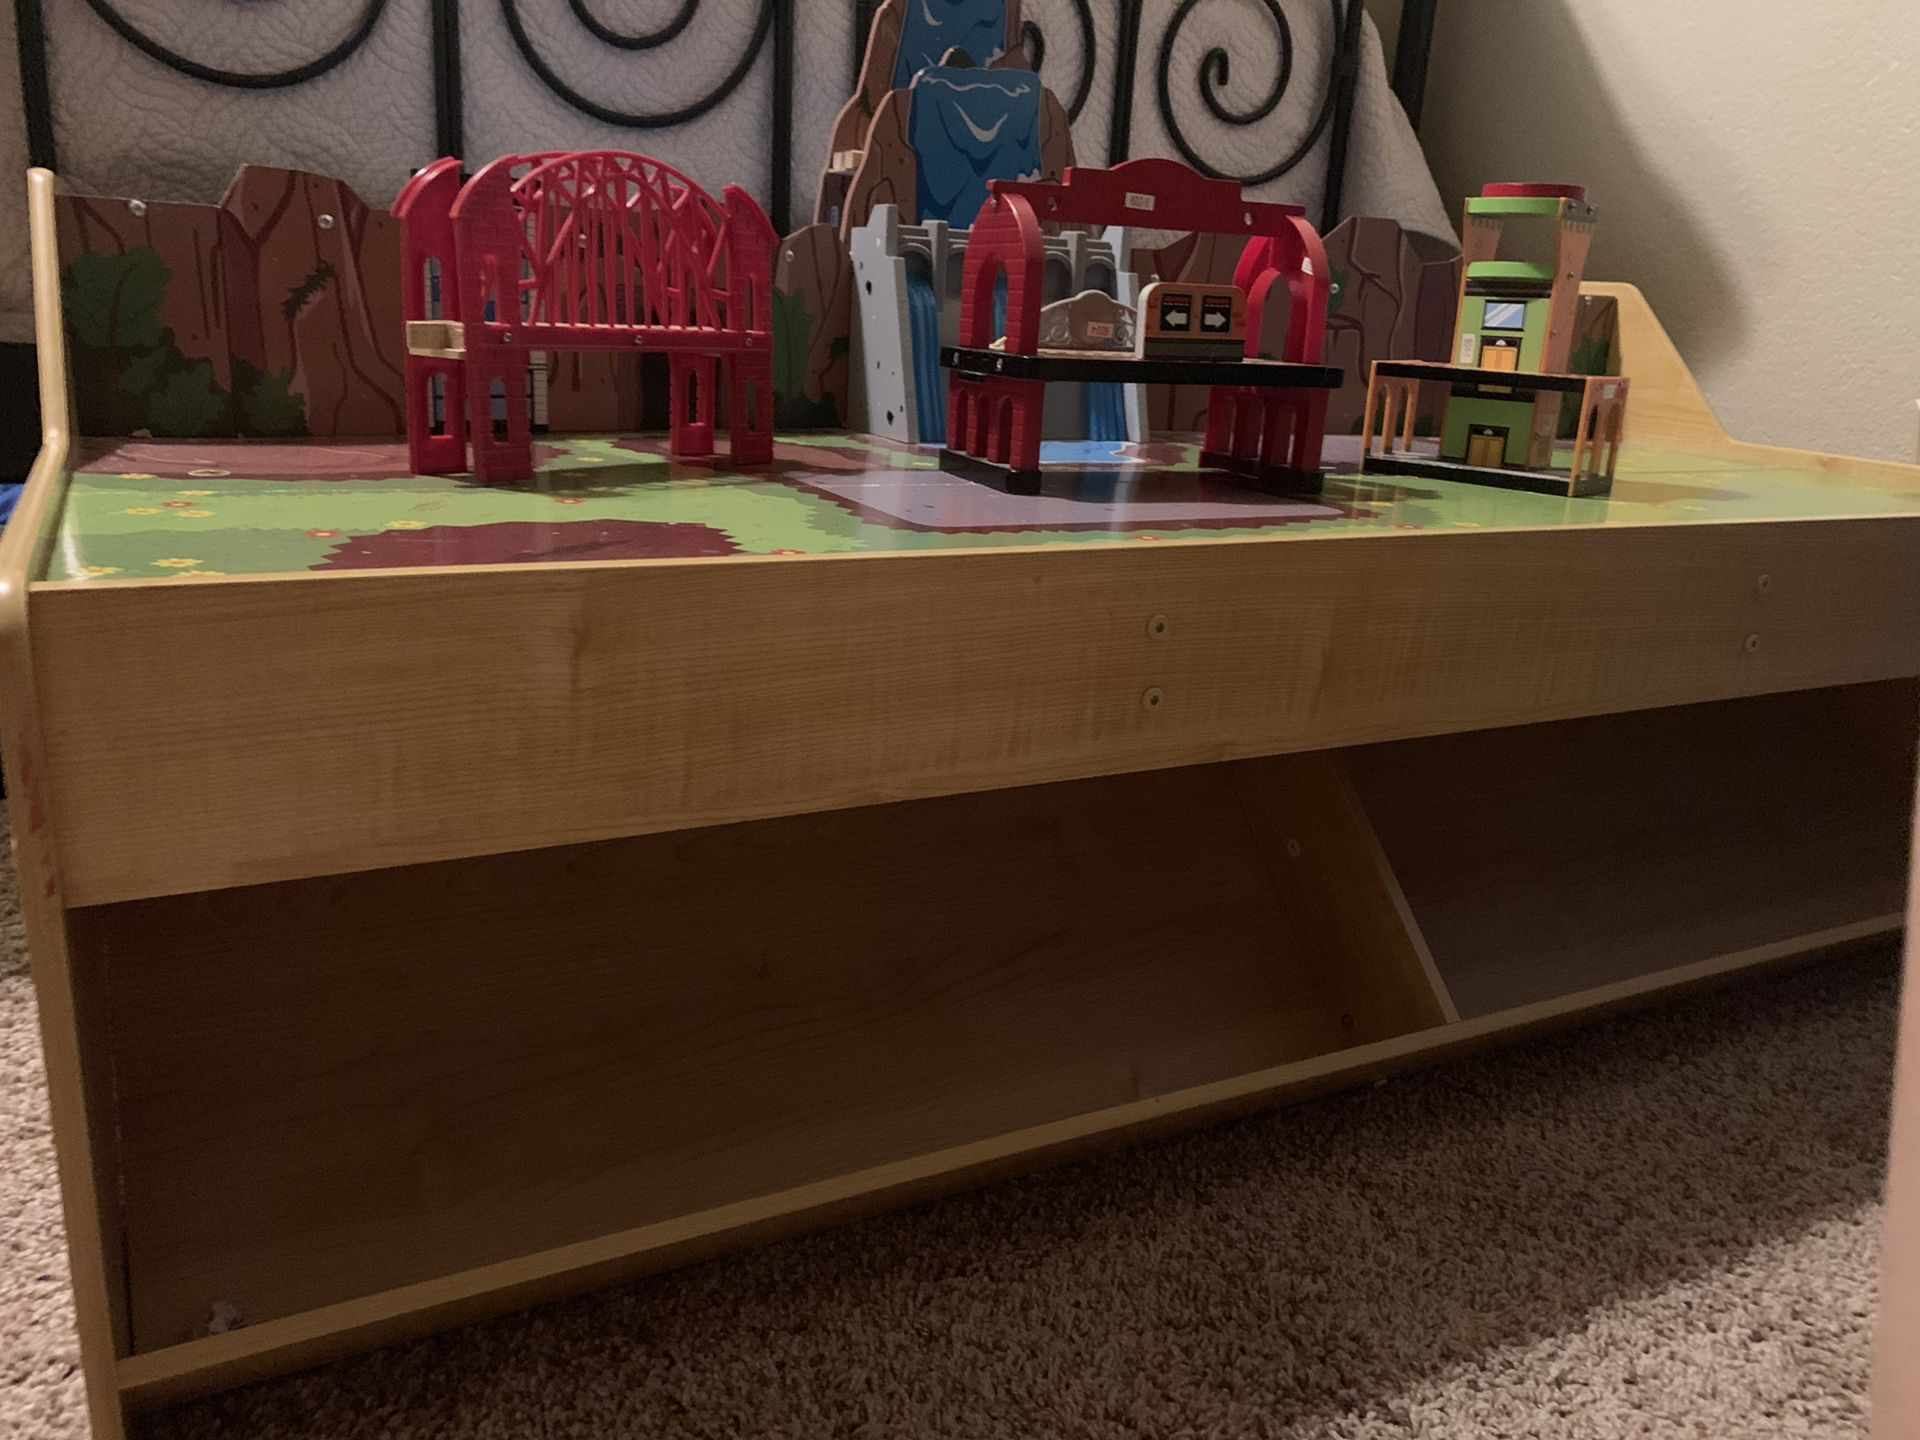 KidKraft 2-level Train Table